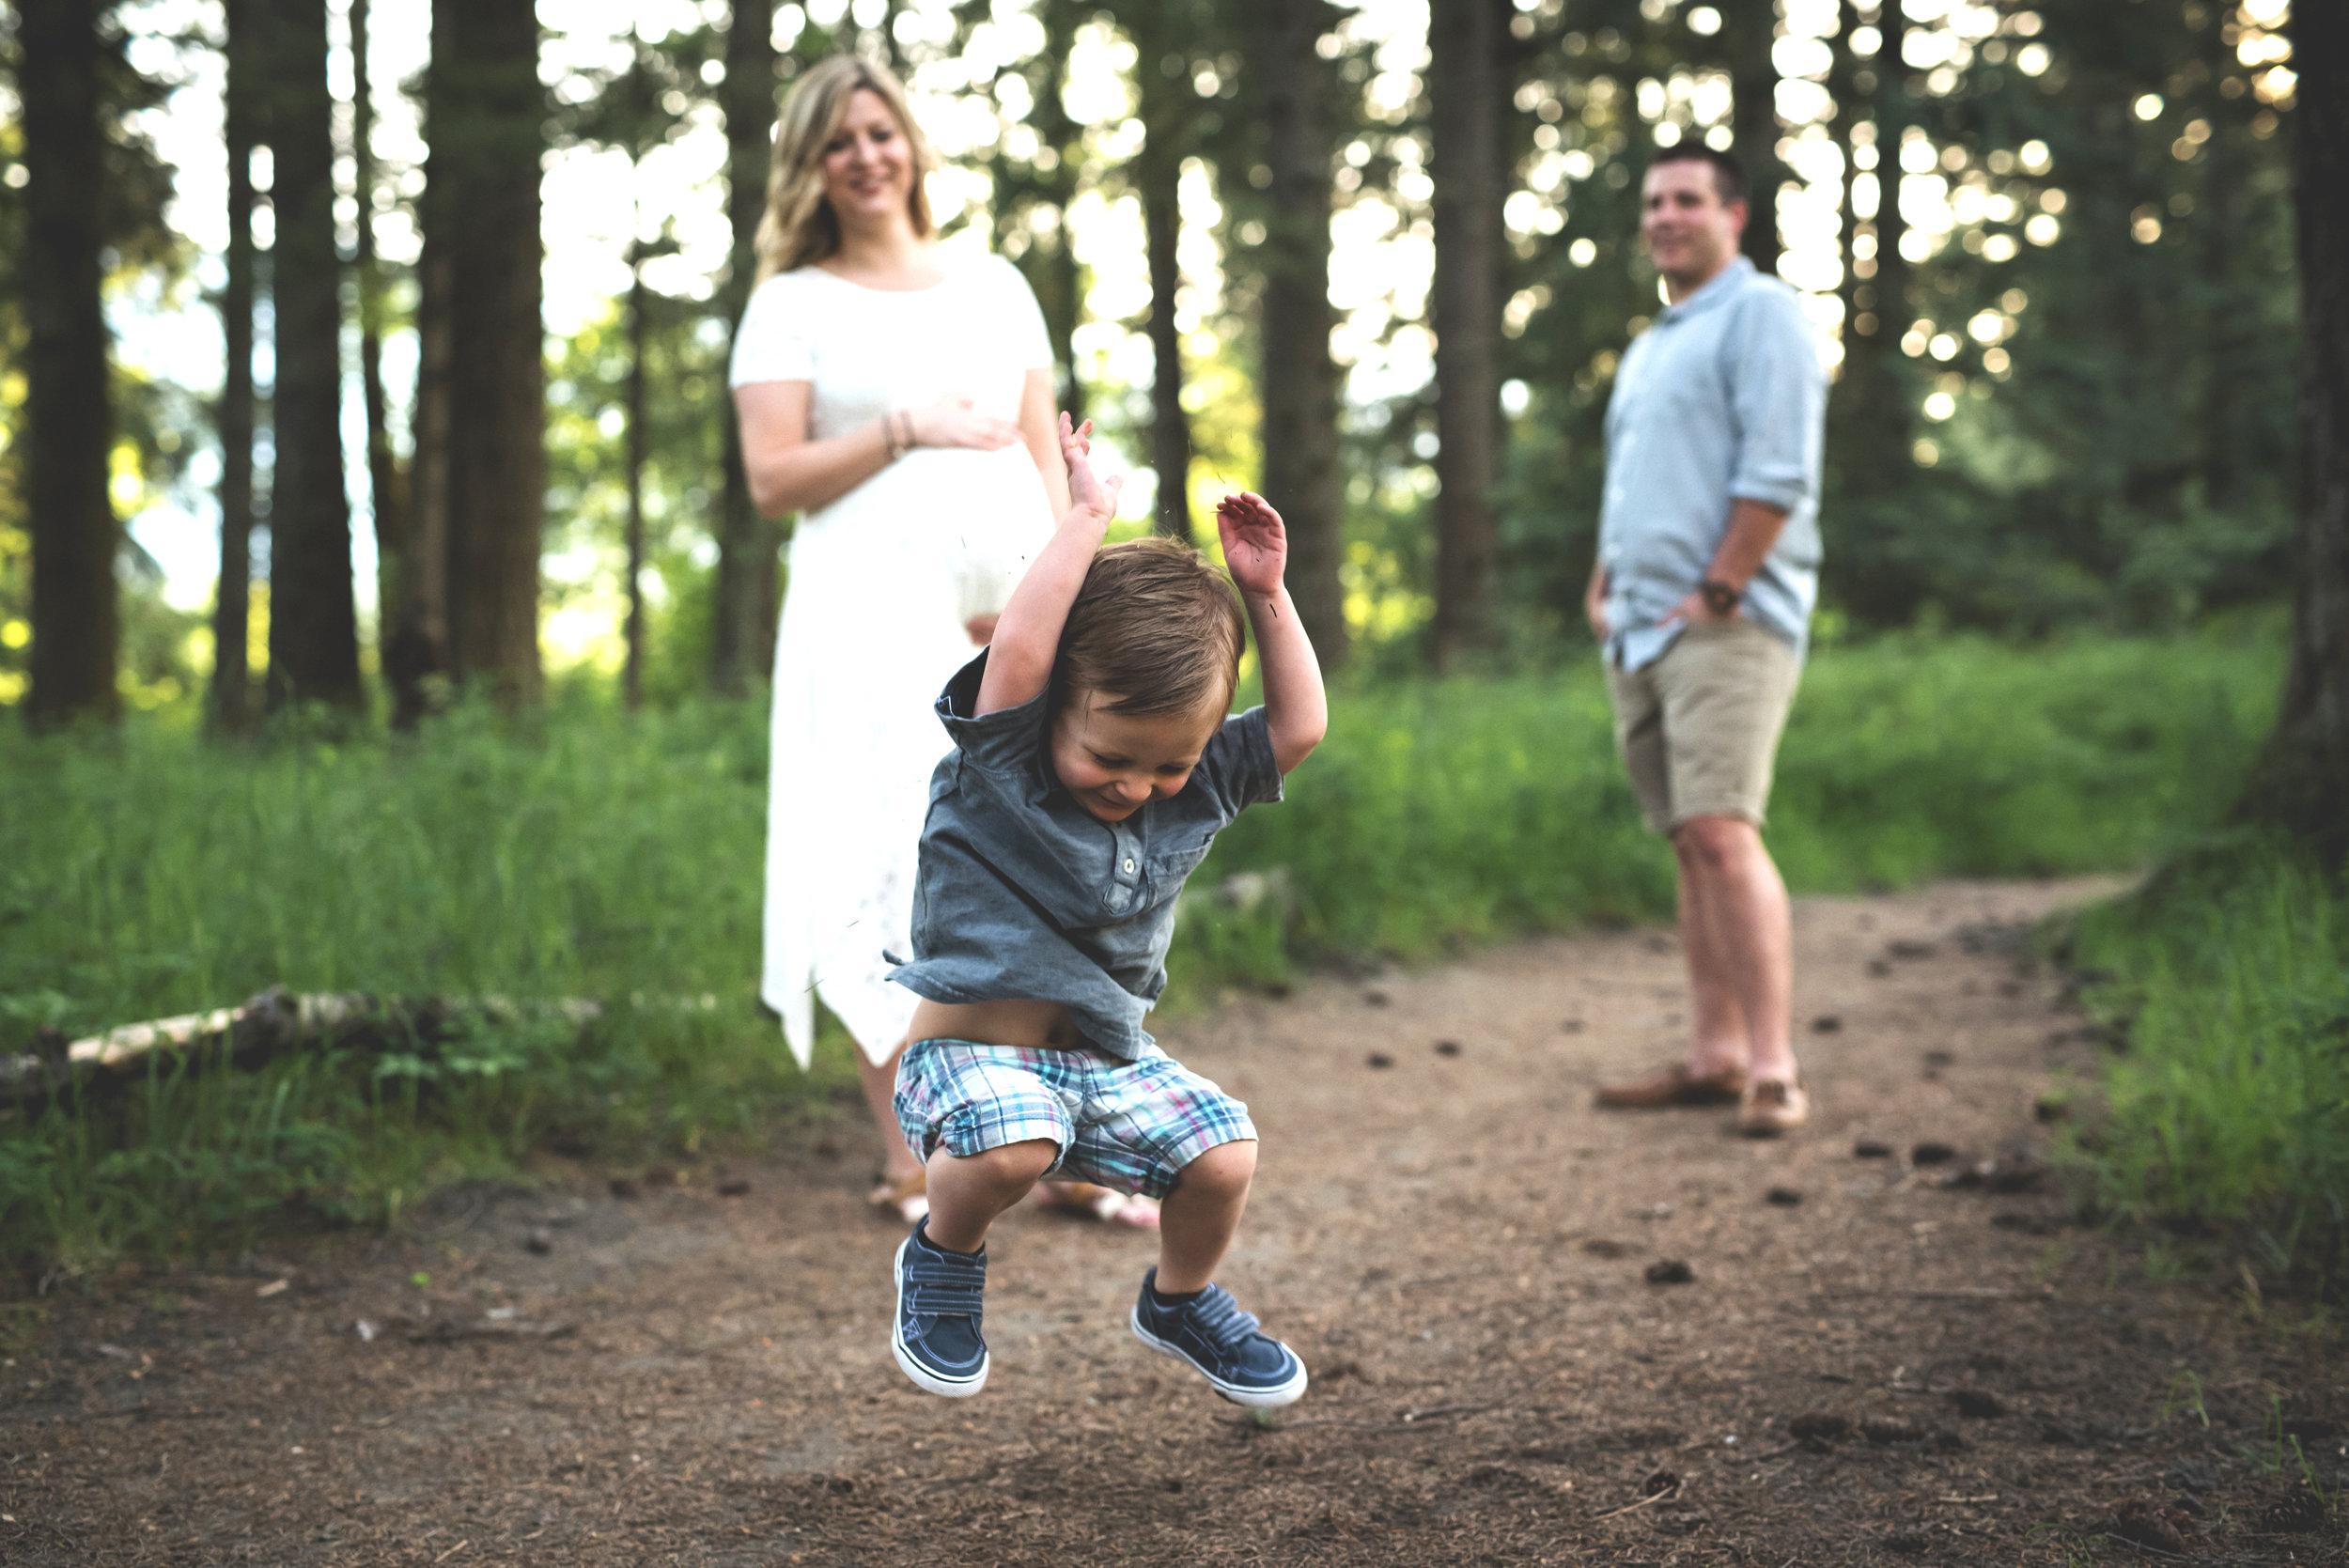 maternityphotos-kristingroverimages-5.jpg